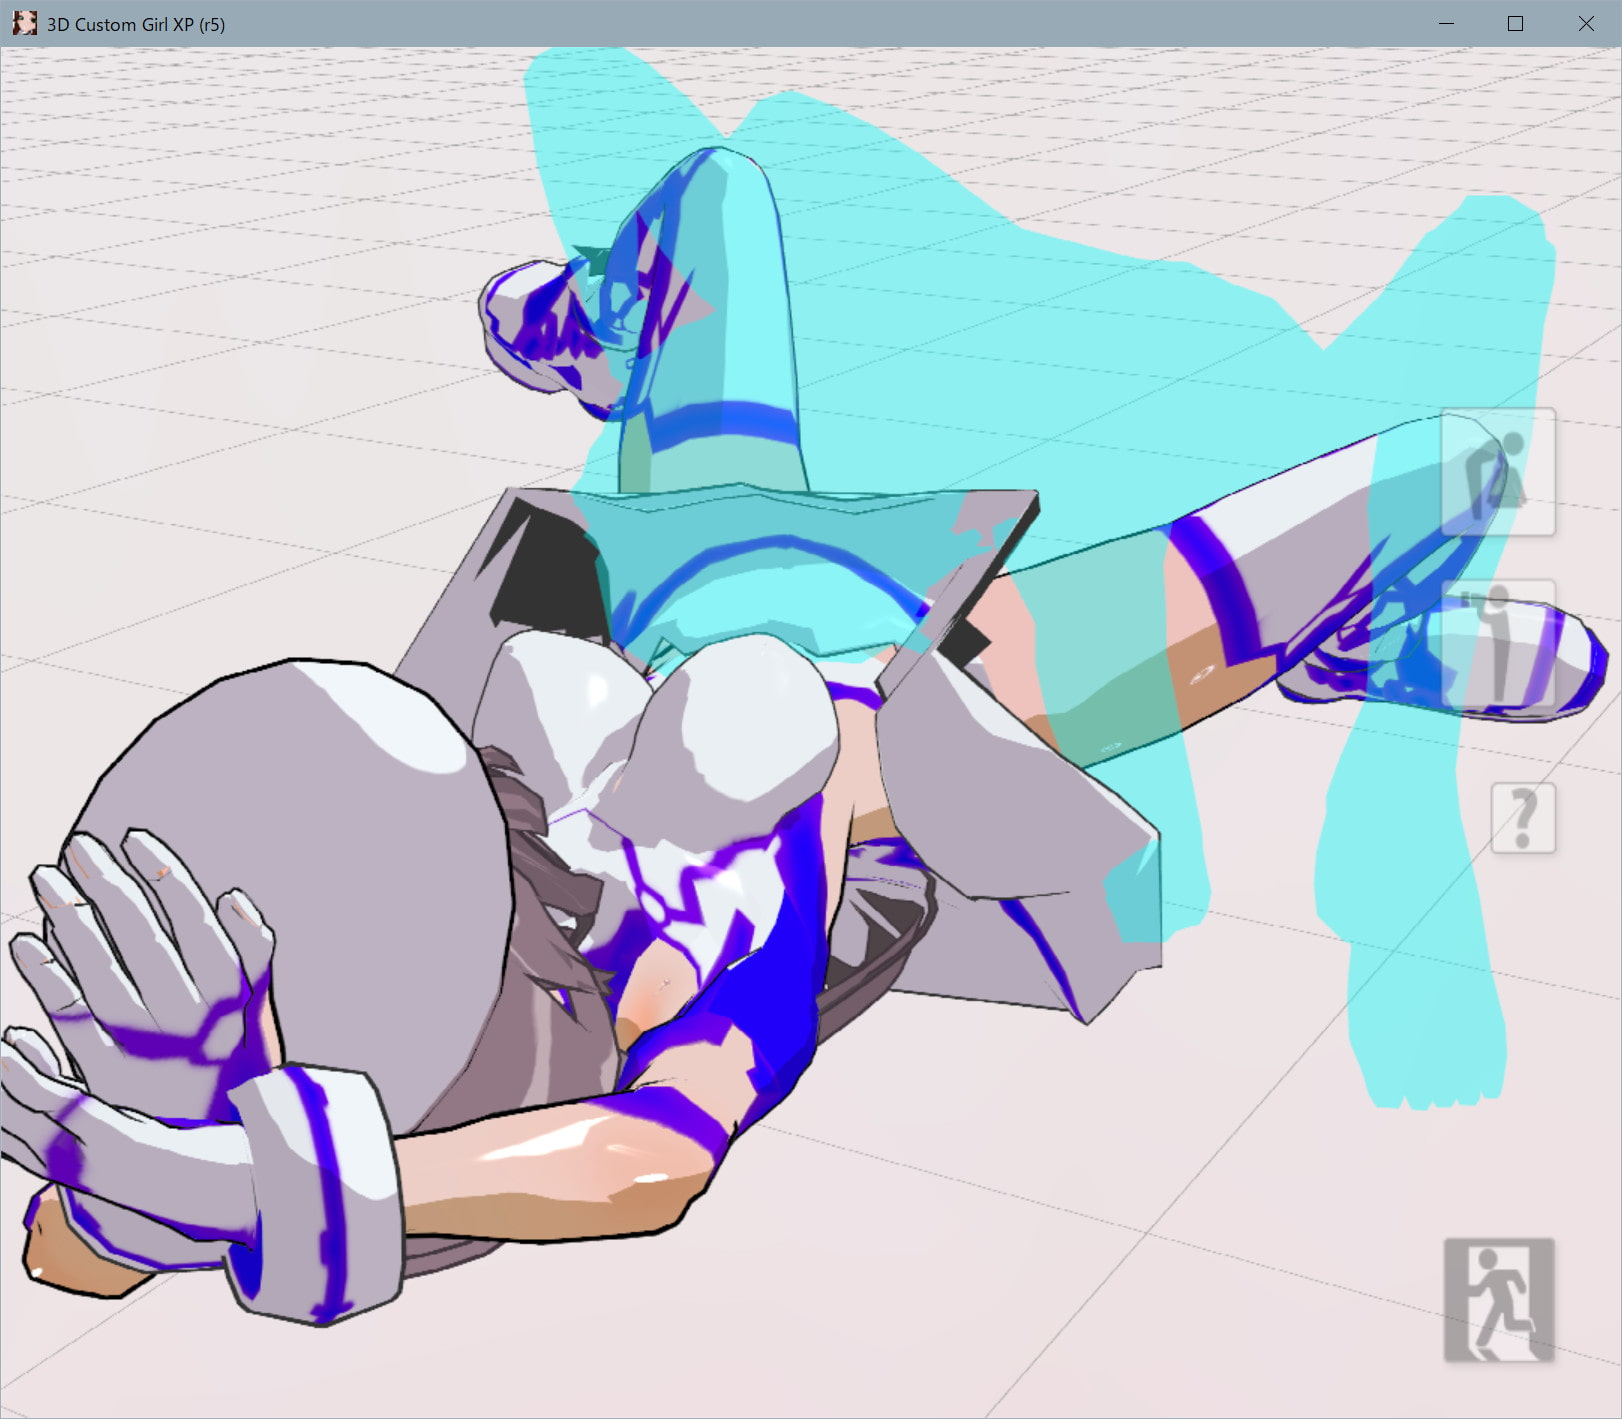 3Dカスタム少女追加モーション正常位smallpack3